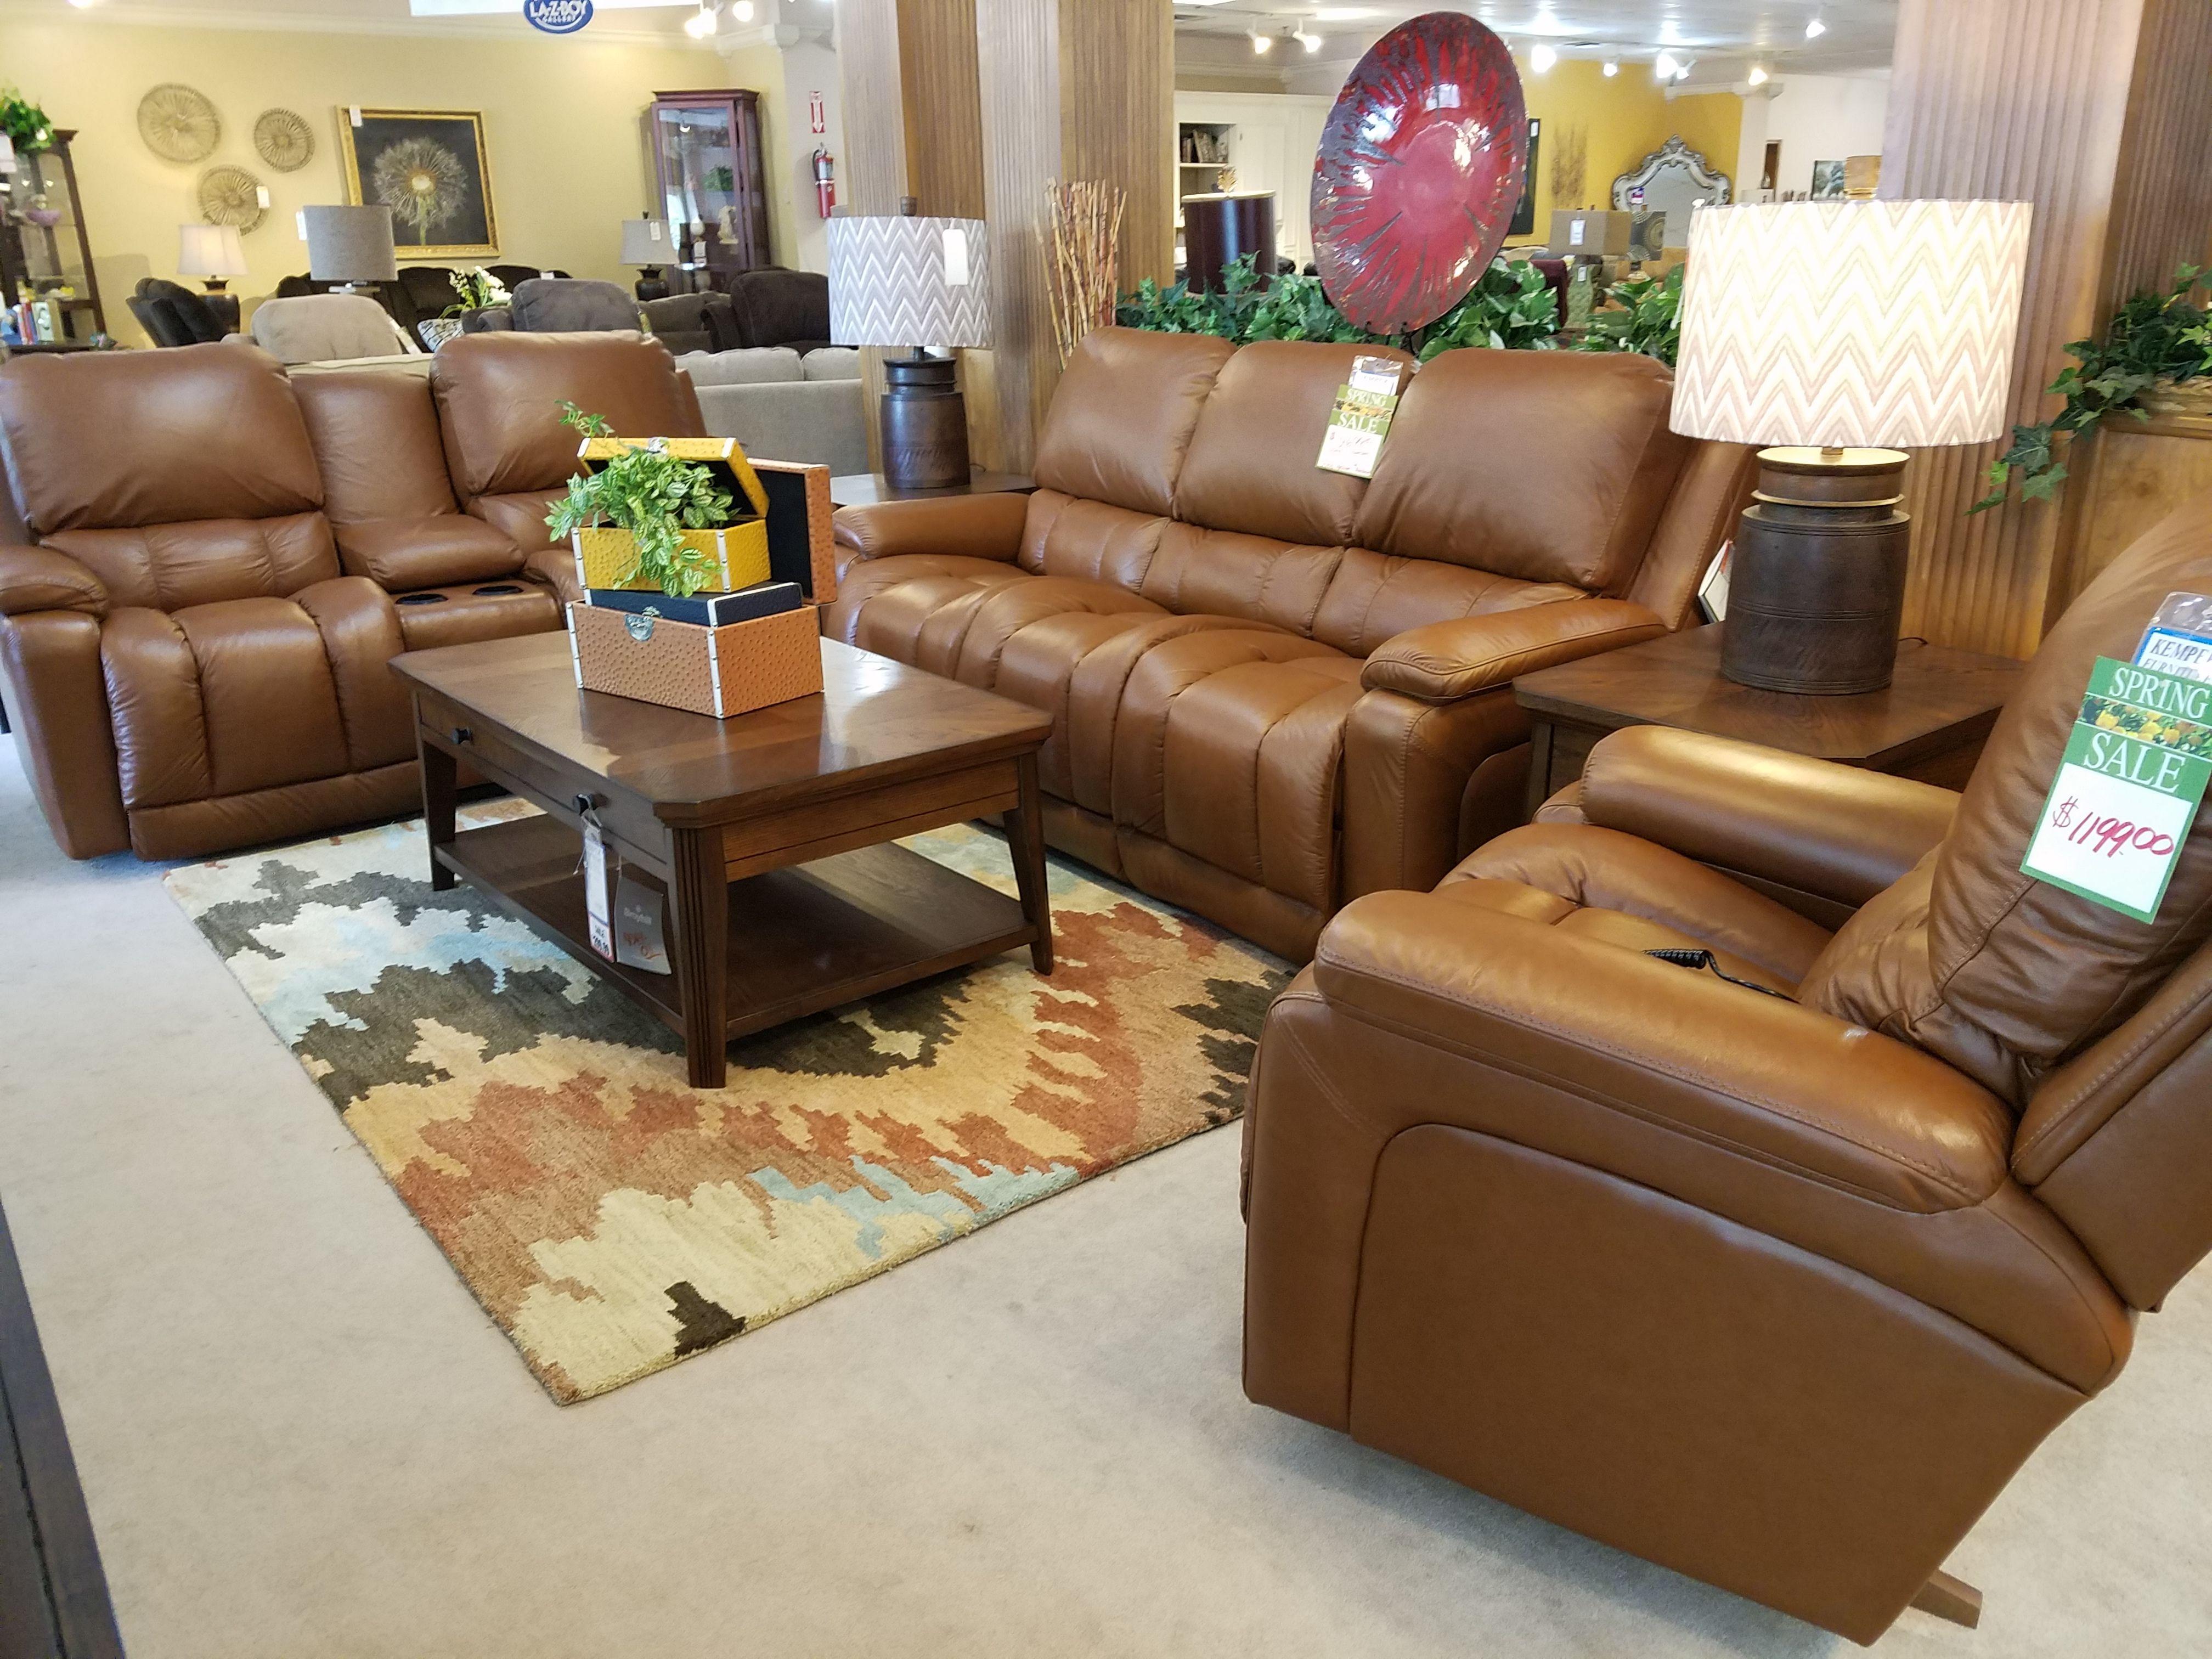 La z Boy at Kemper Furniture Hazard KY 530 LG